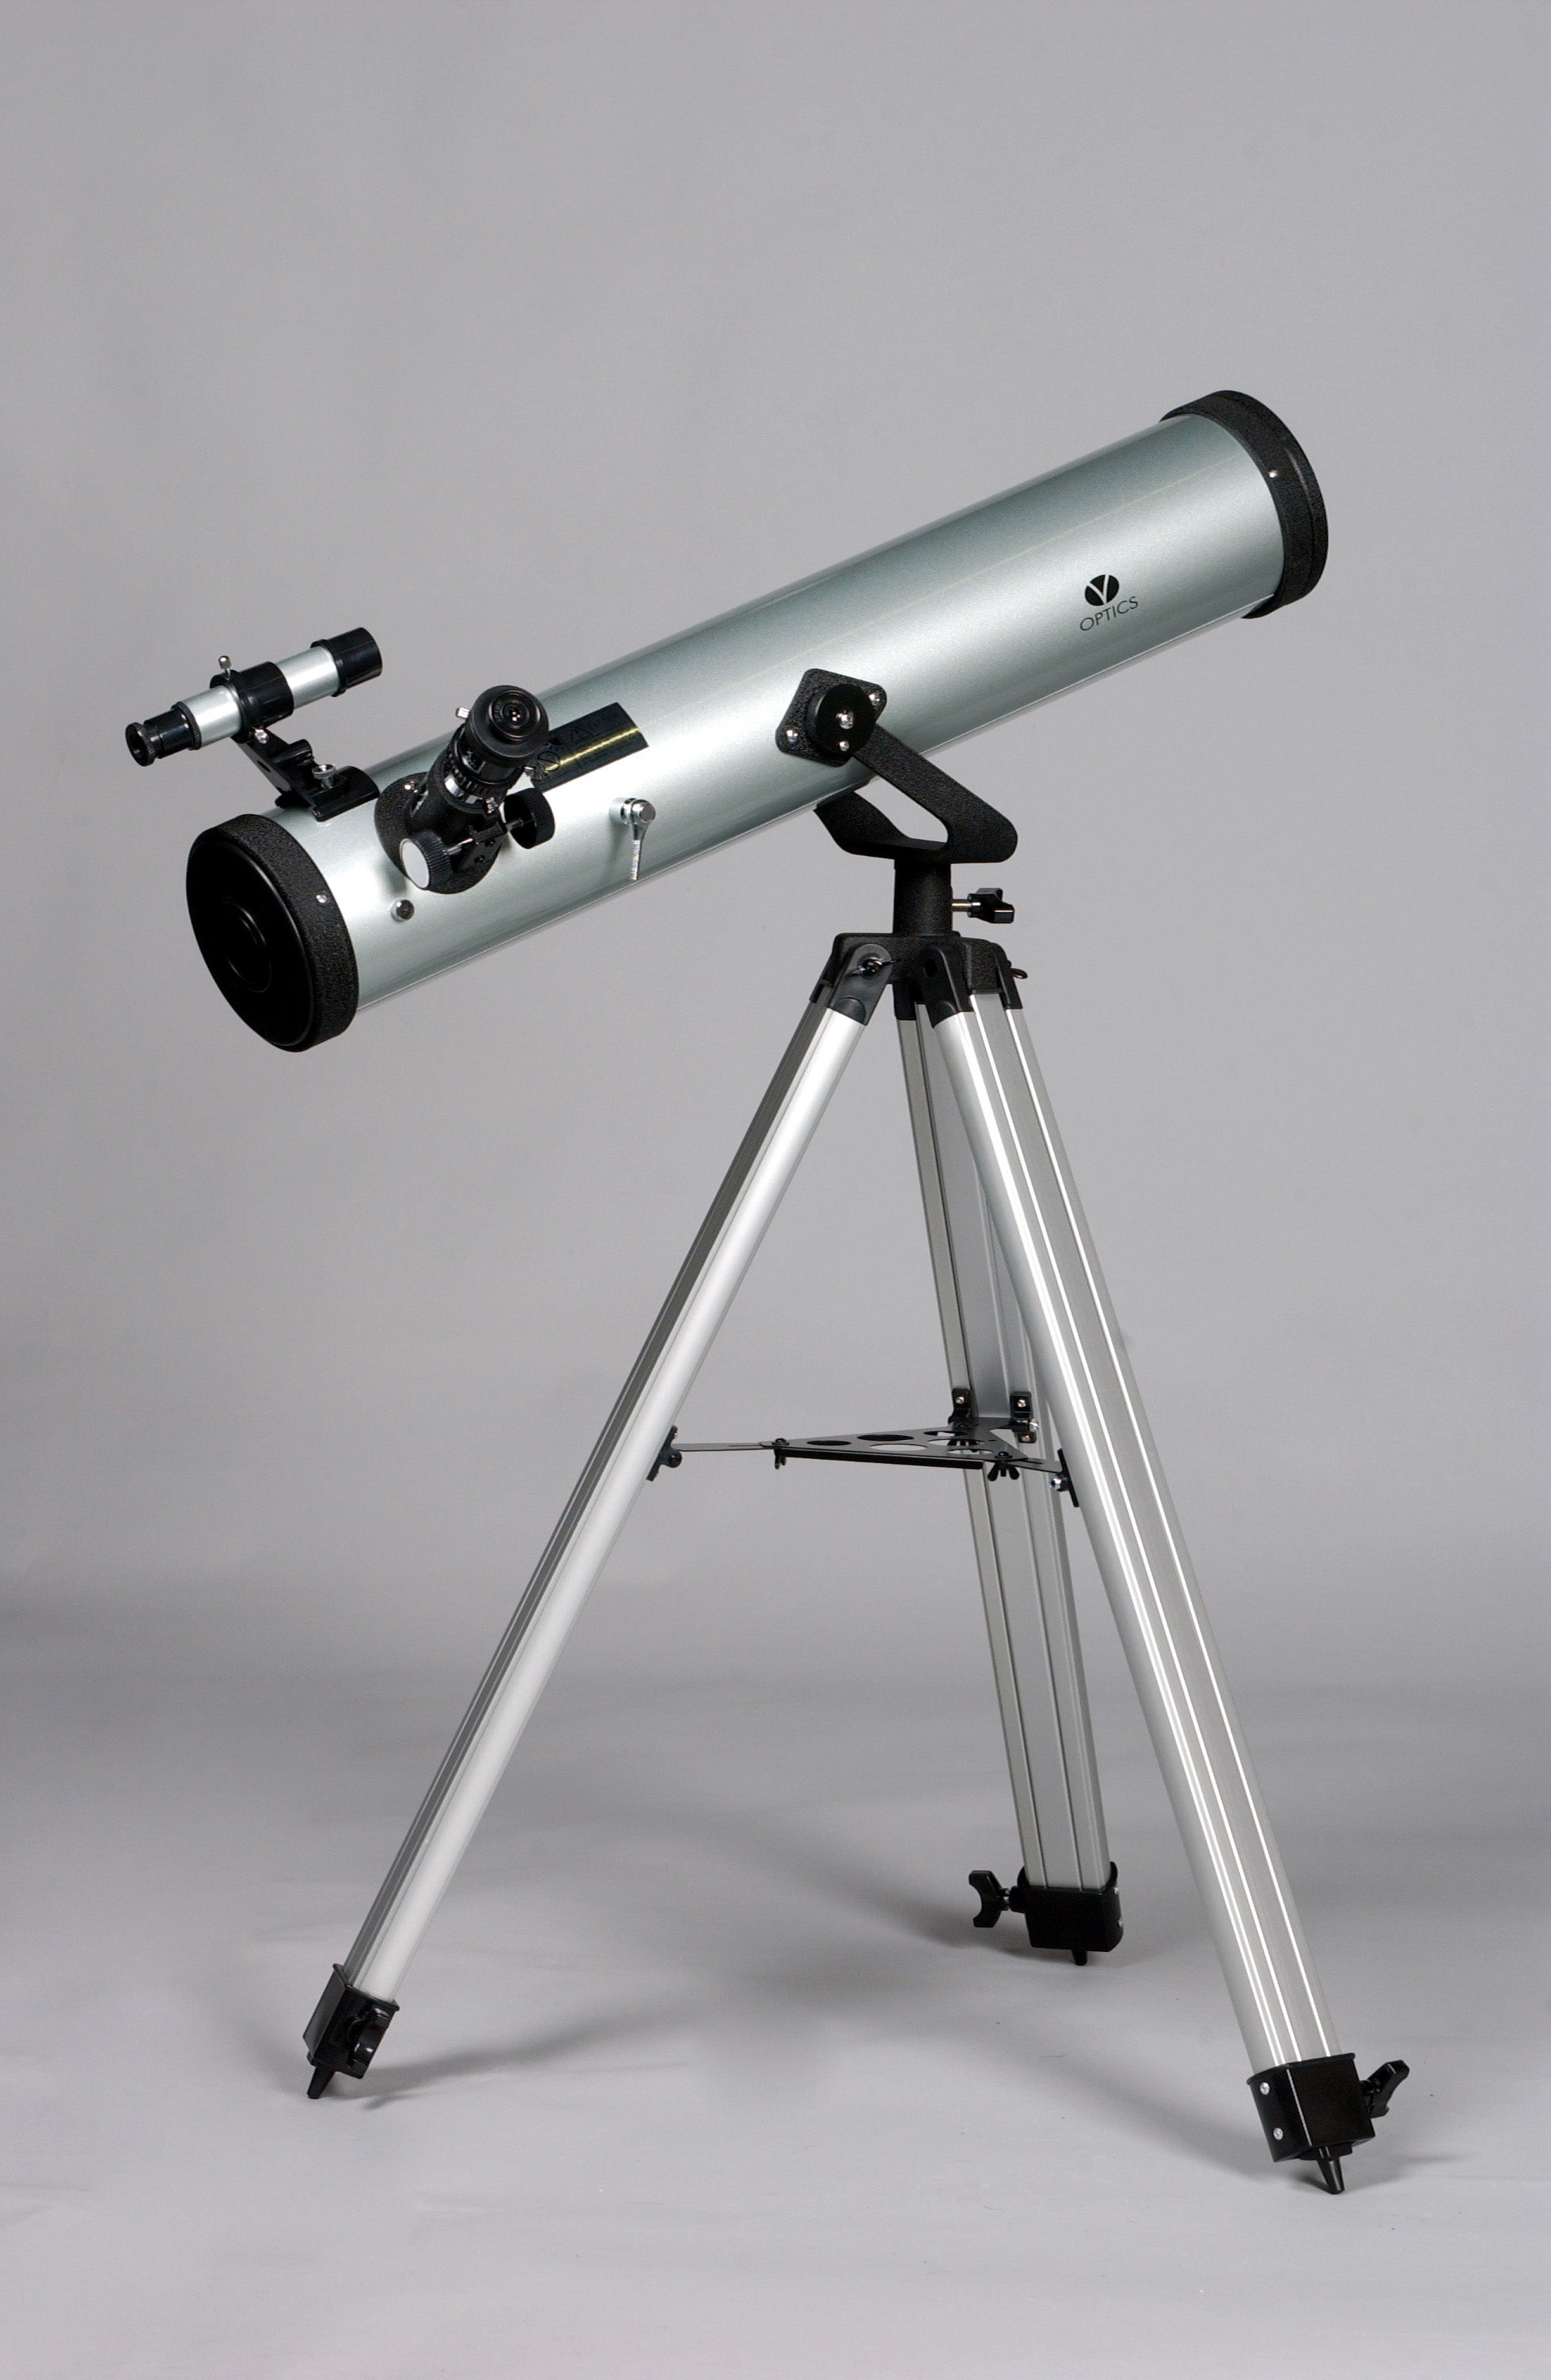 76mm x 700 mm Reflector Telescope - Thumbnail 1